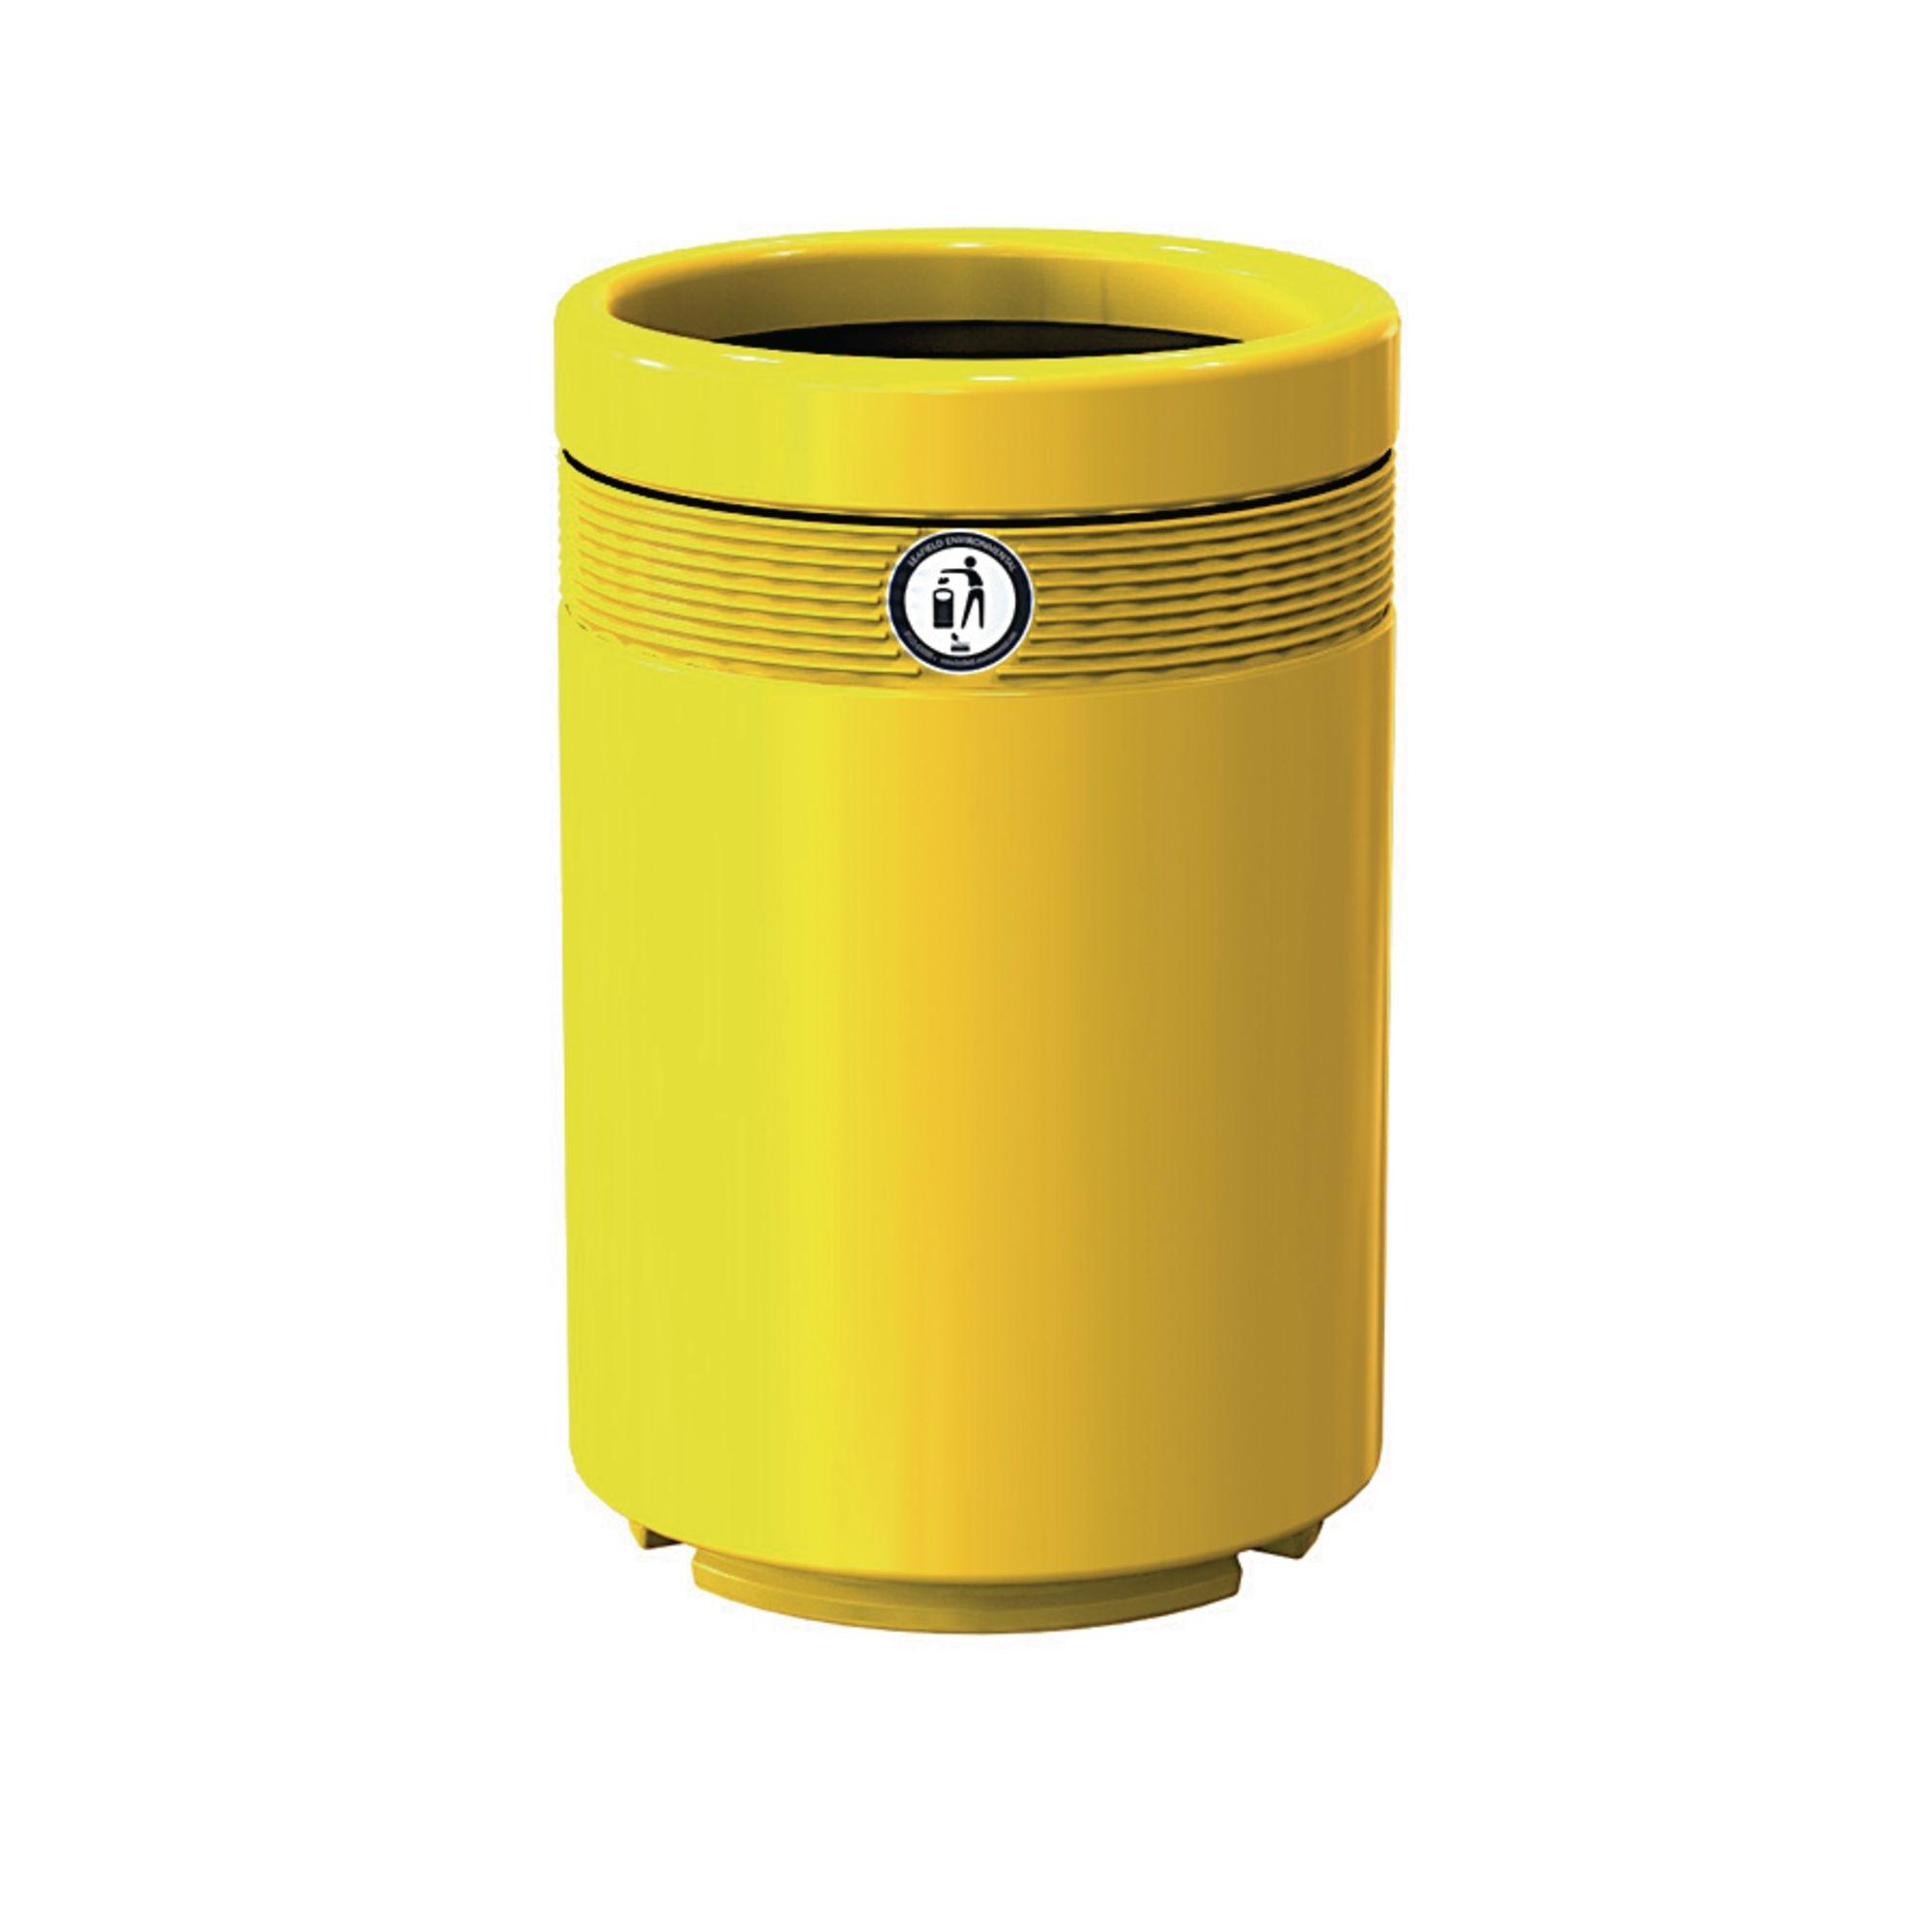 Monarch Litter Bin Economy Yellow